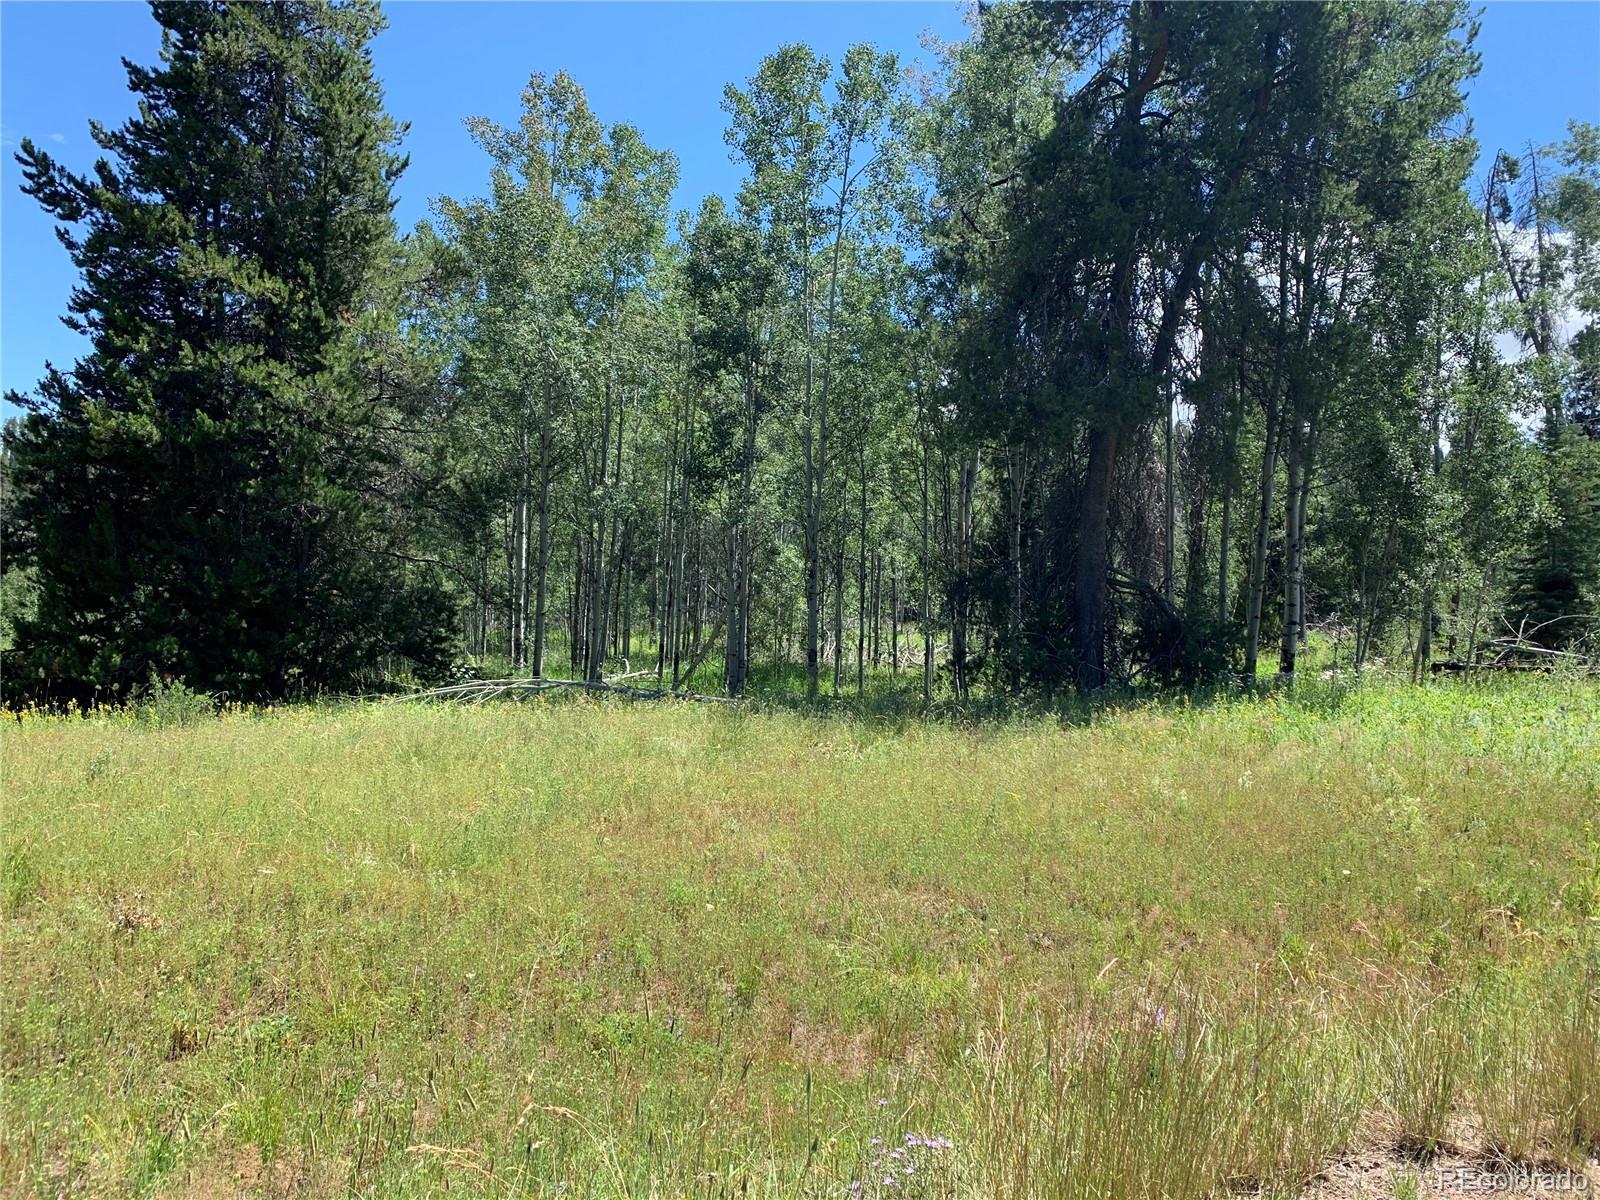 22320 Cheyenne Trail Property Photo - Oak Creek, CO real estate listing